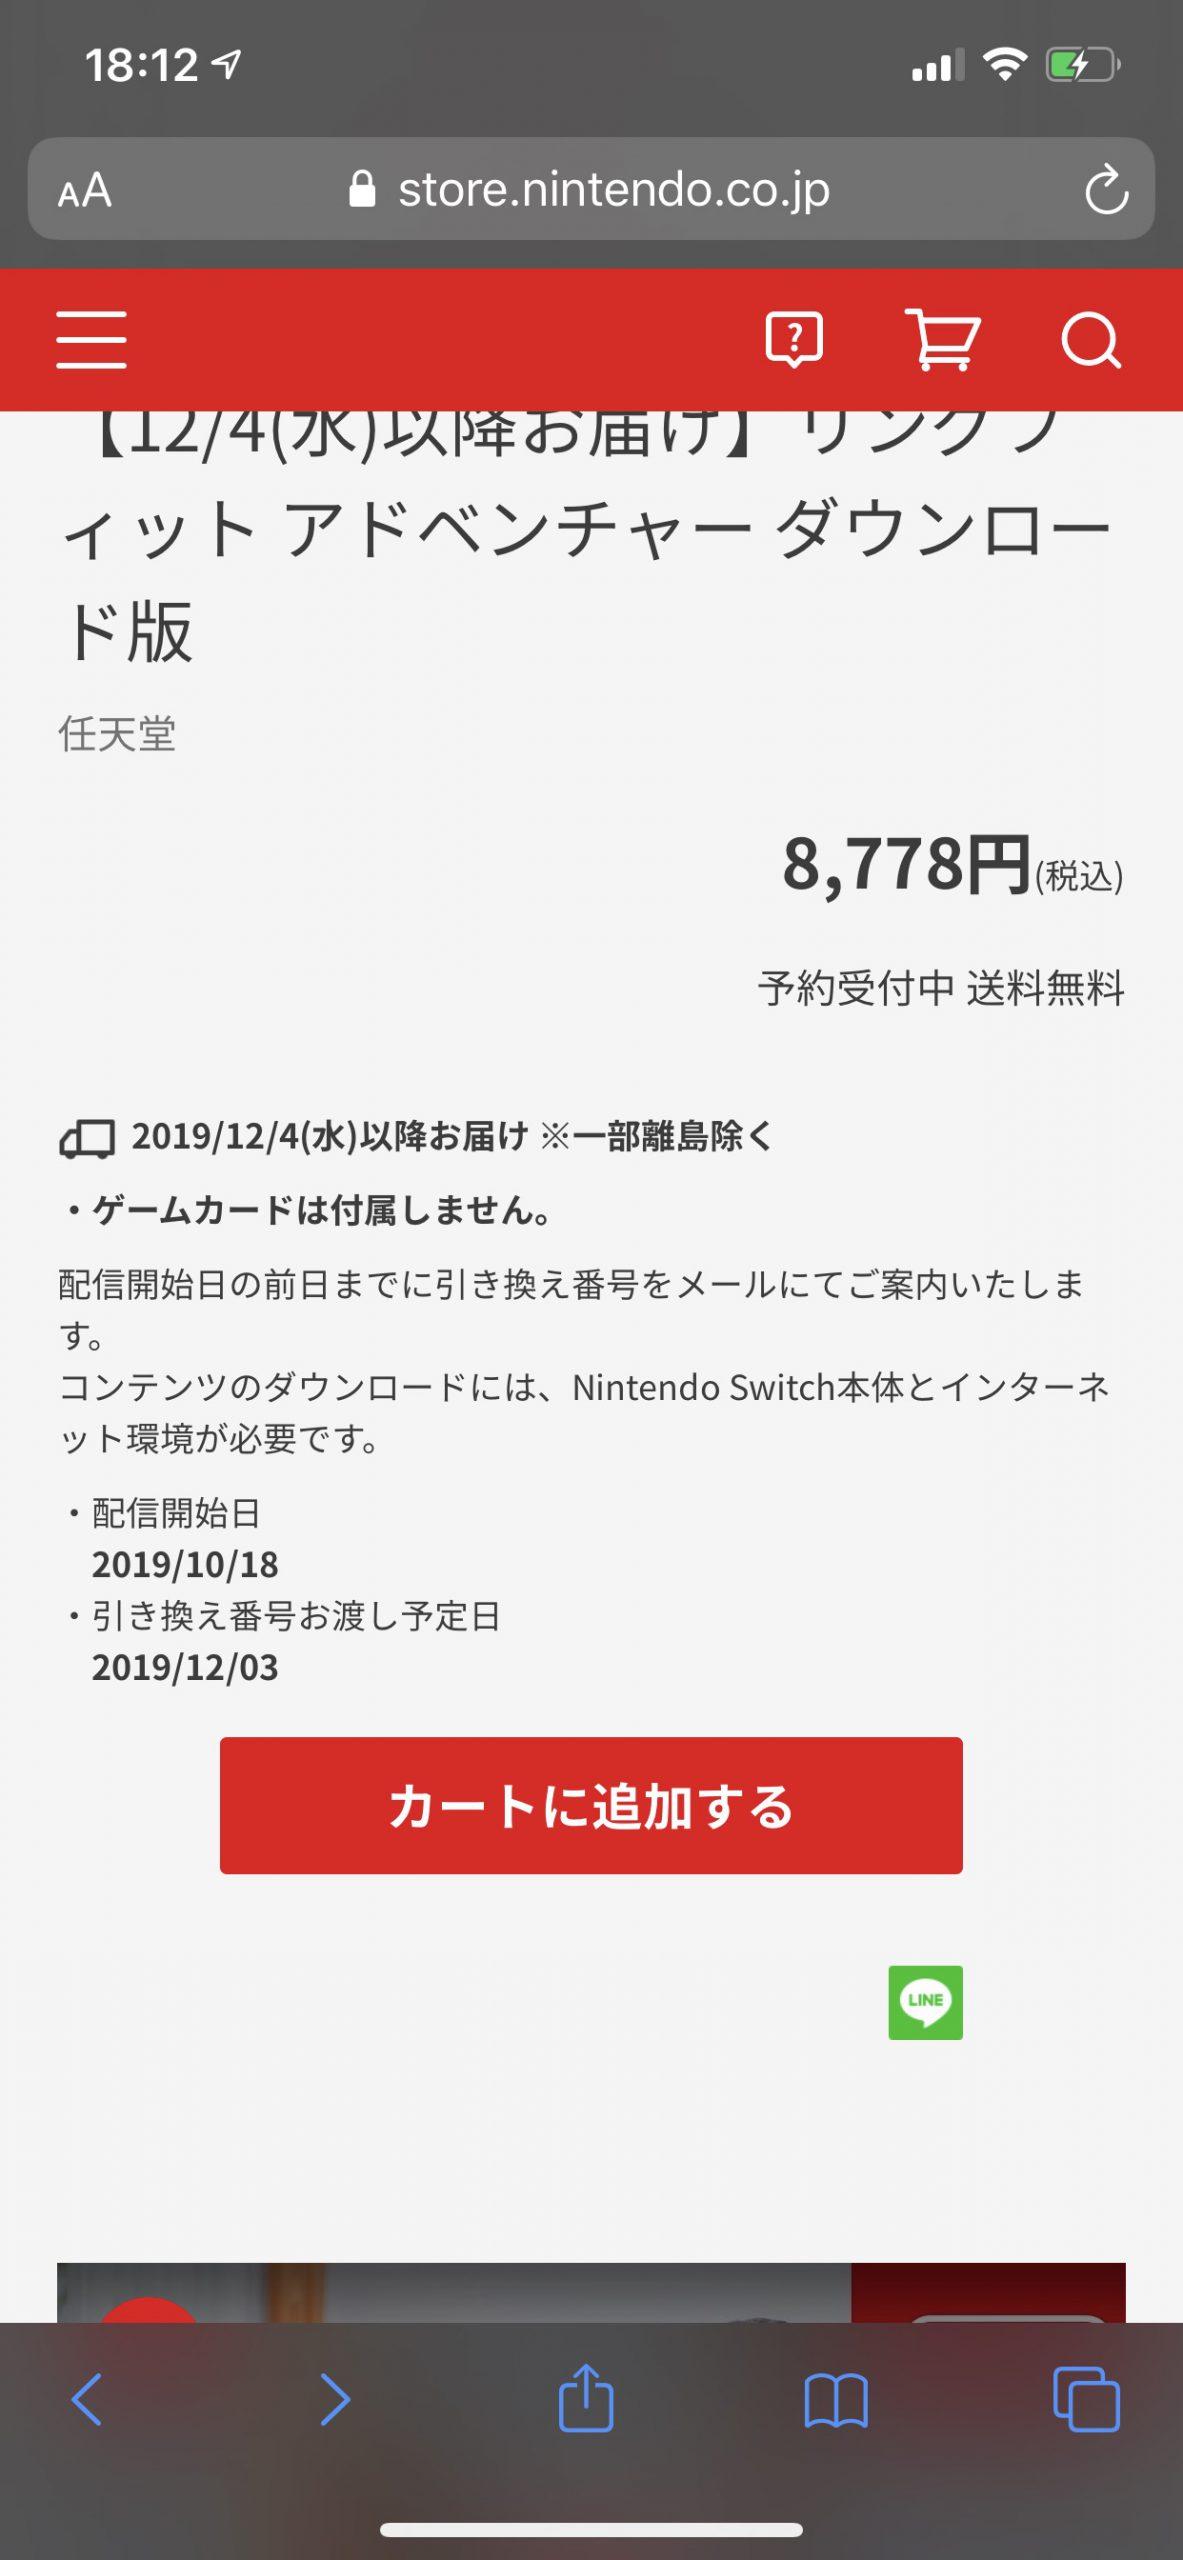 iPXjgz9 scaled - リングフィットアドベンチャー品薄のお詫び